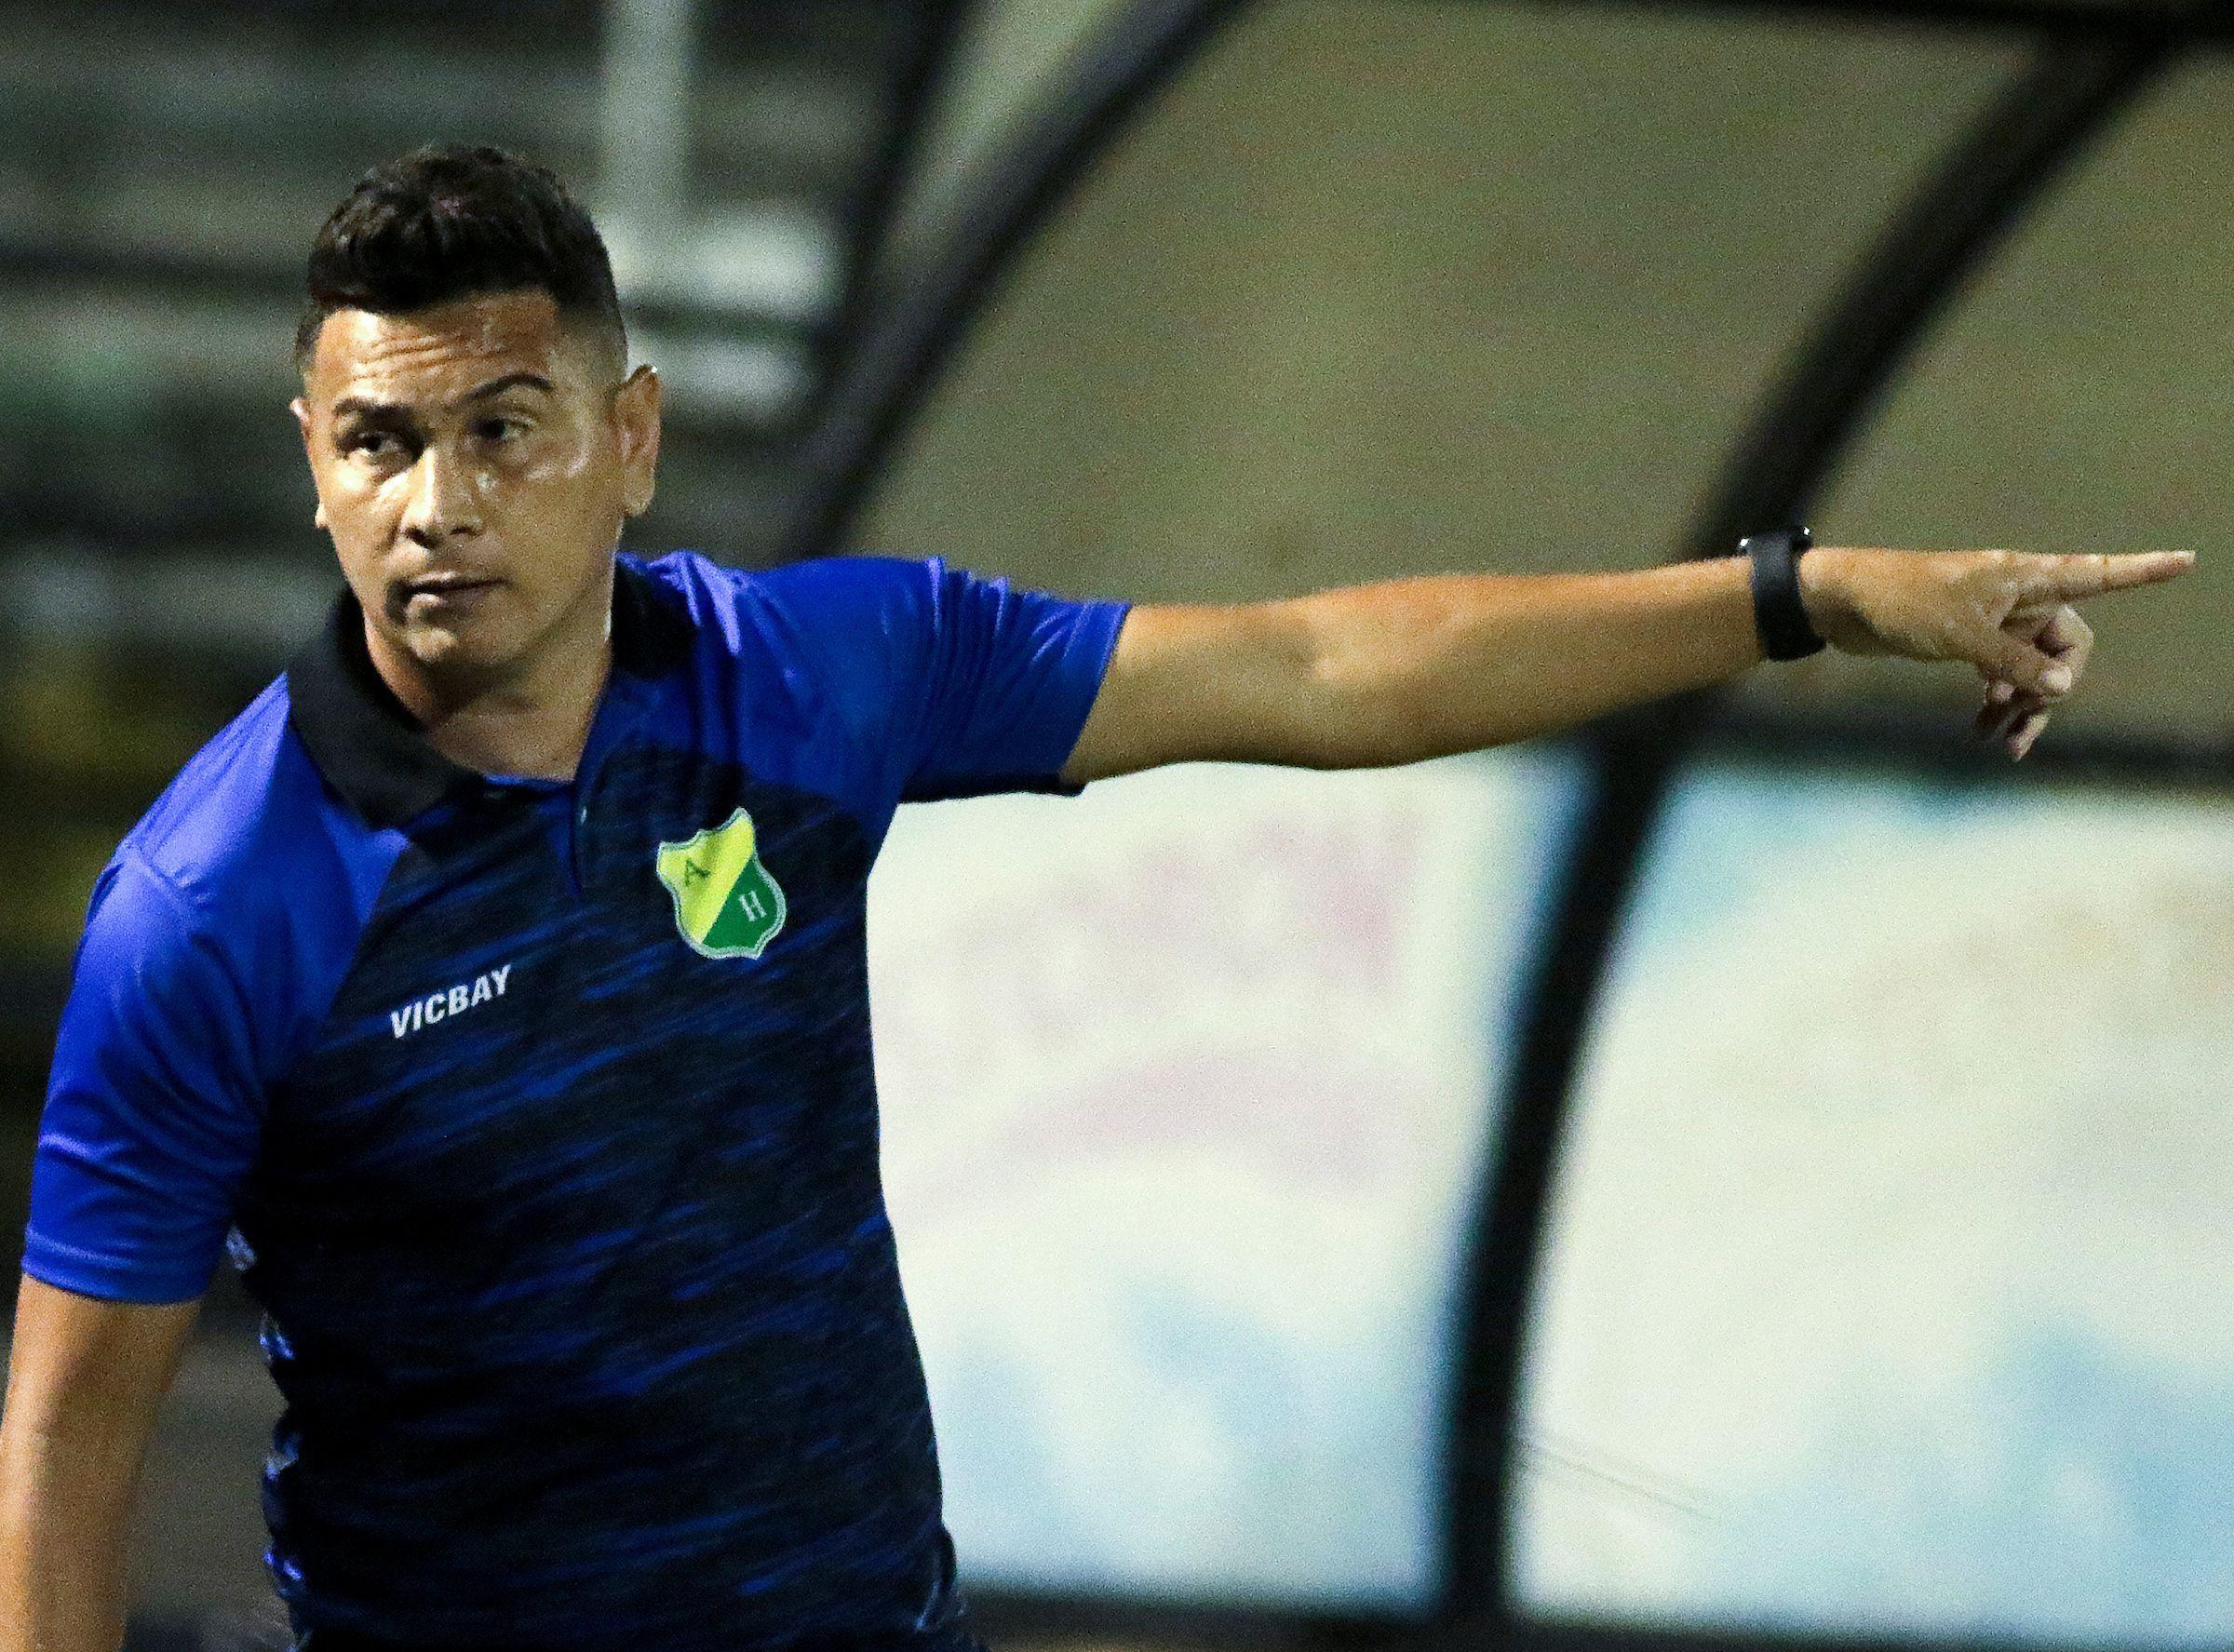 Dayron Pérez renunció a la dirección técnica del Atlético Huila